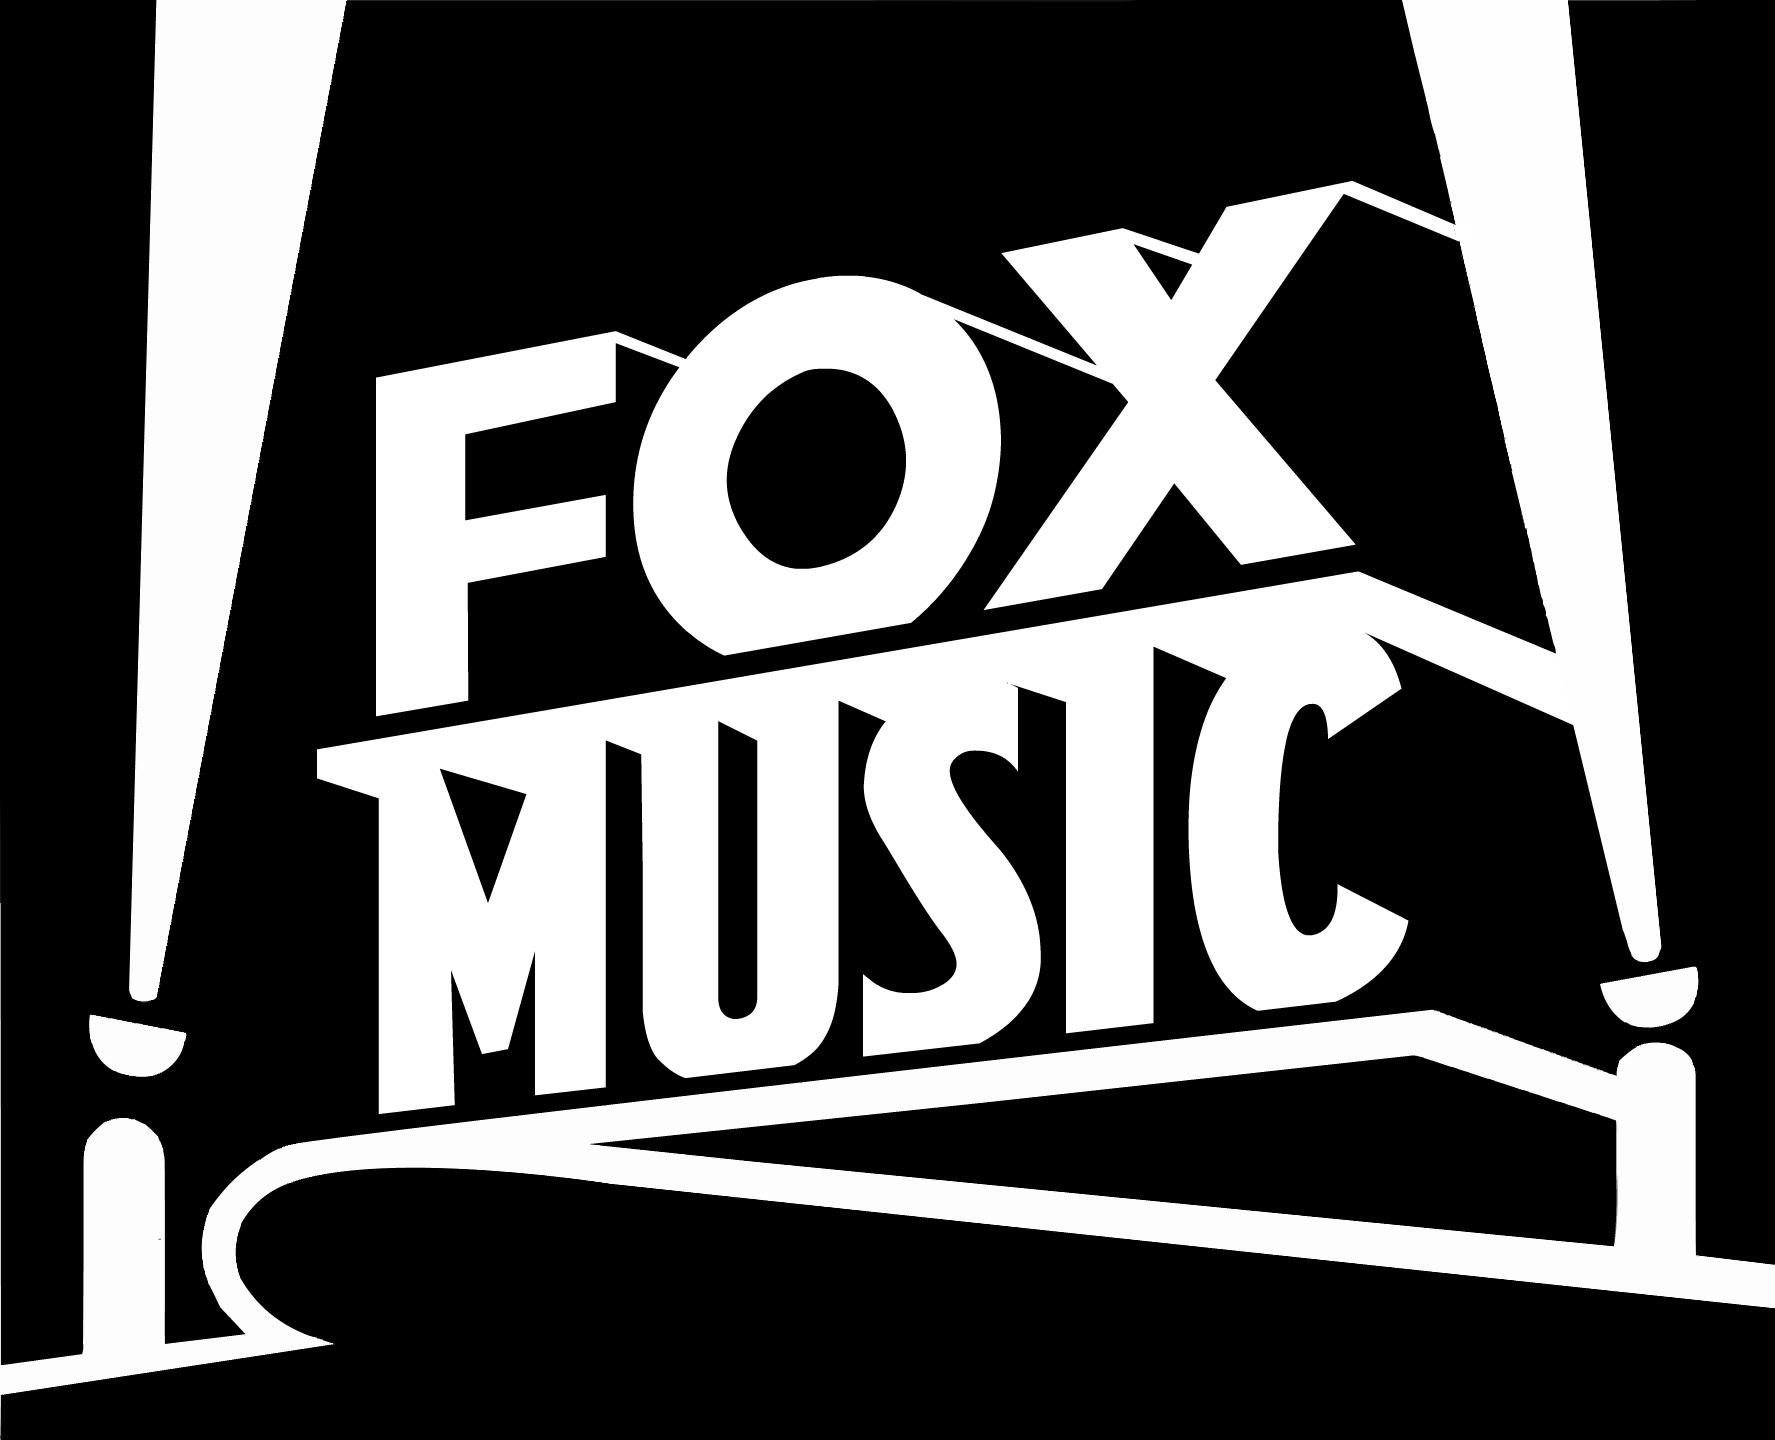 Fox music logopedia fandom powered by wikia for Classic house songs 2000